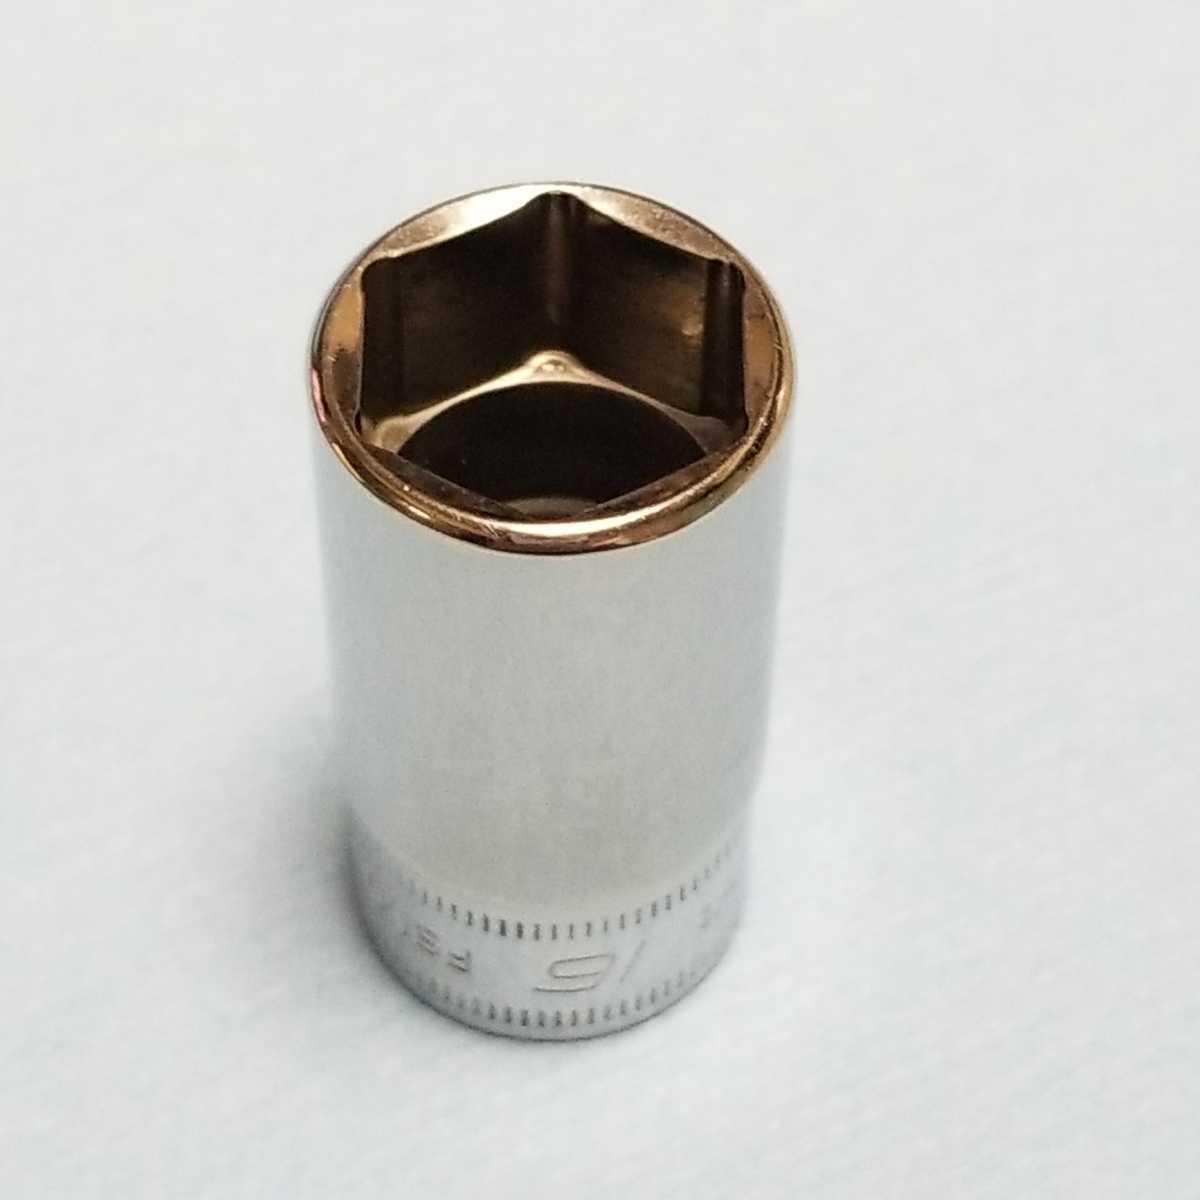 16mm 3/8 セミディープ スナップオン FSMS16 (6角) 中古品 美品 保管品 SNAPON SNAP-ON セミディープソケット ソケット 送料無料 _画像3